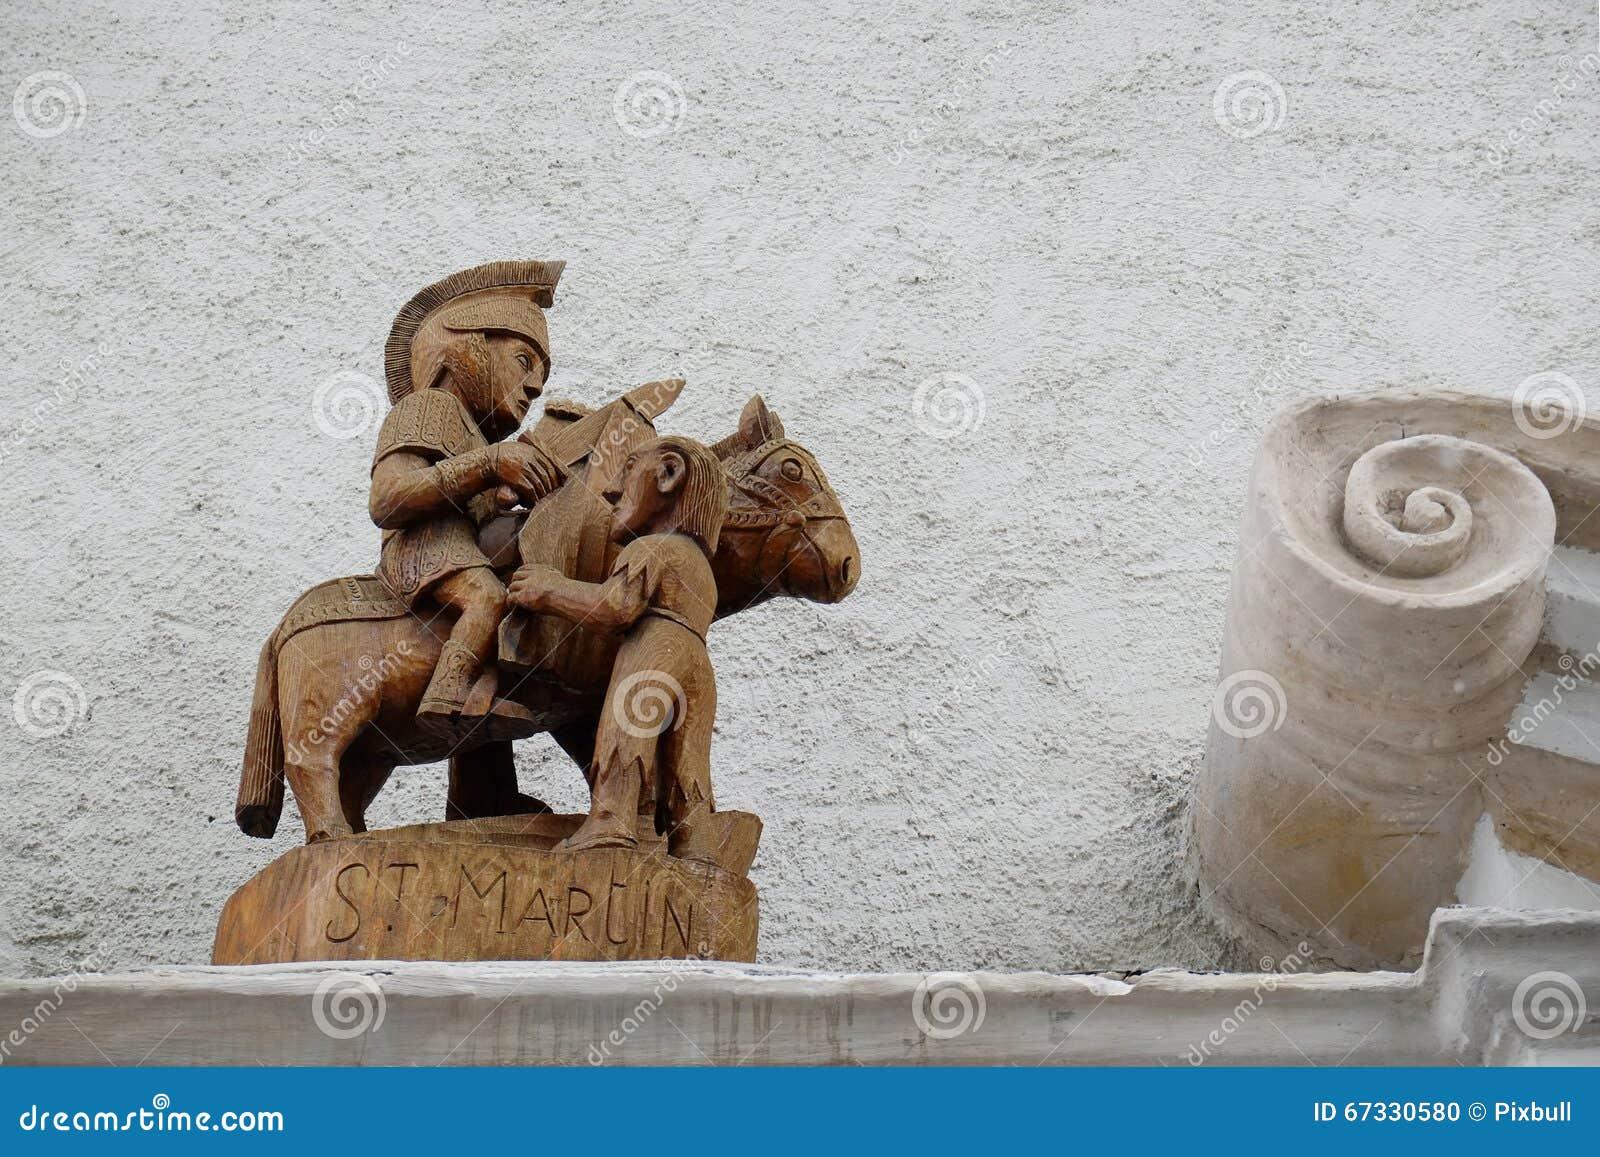 Escultura de madeira medieval St Martin